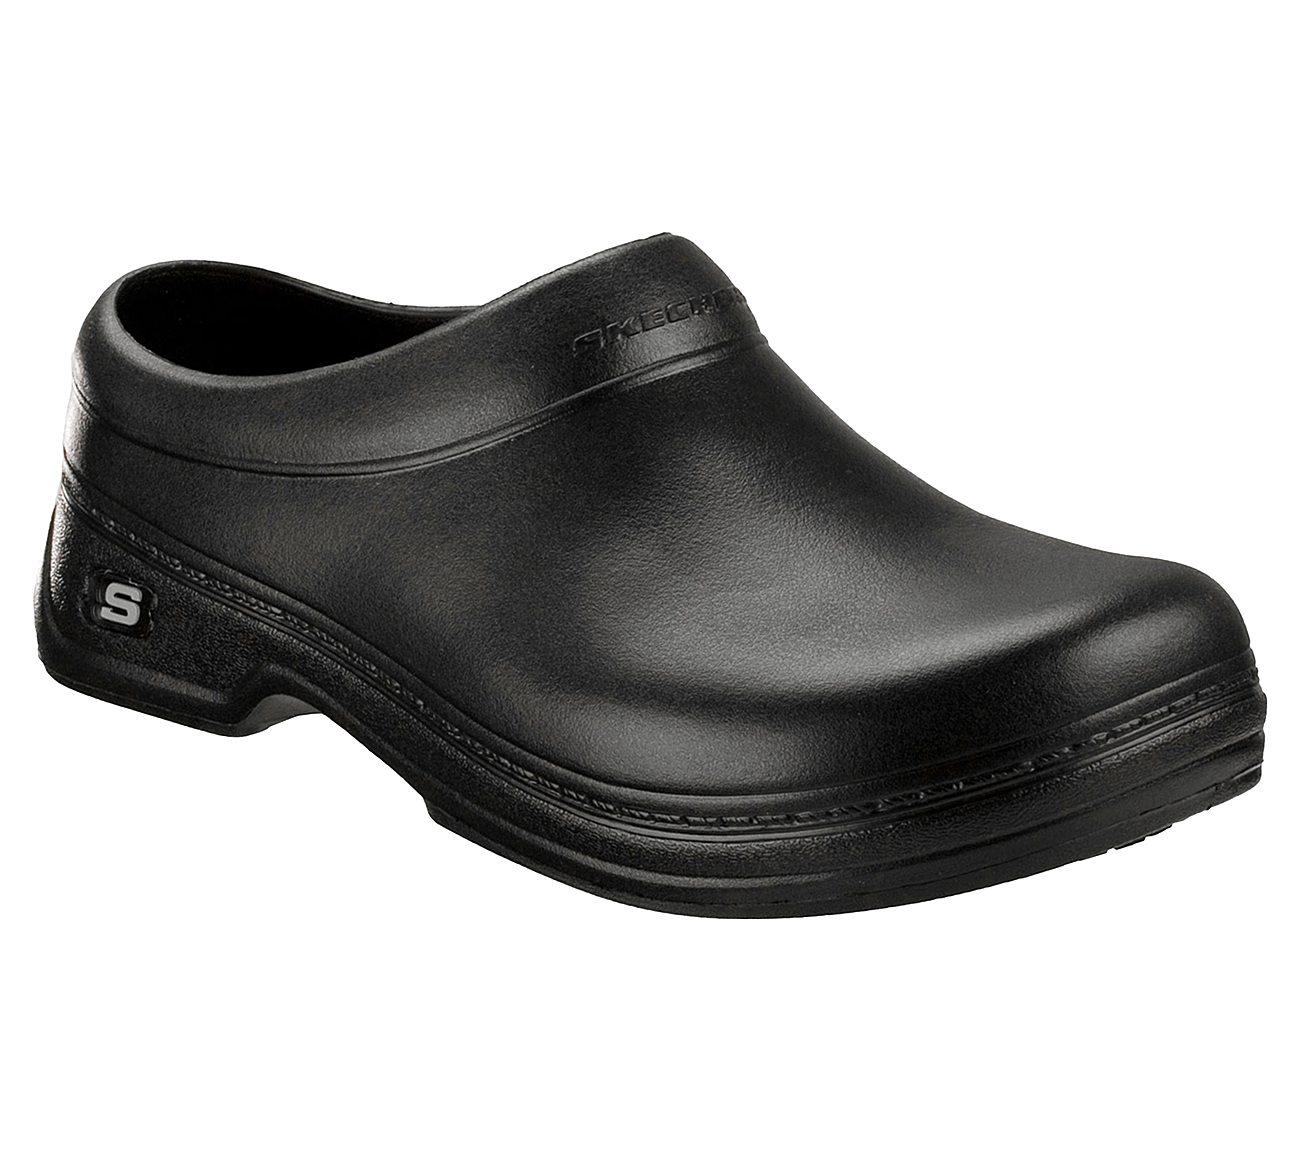 8aa22b31 Buy SKECHERS Work: Oswald - Balder Work Shoes only $55.00